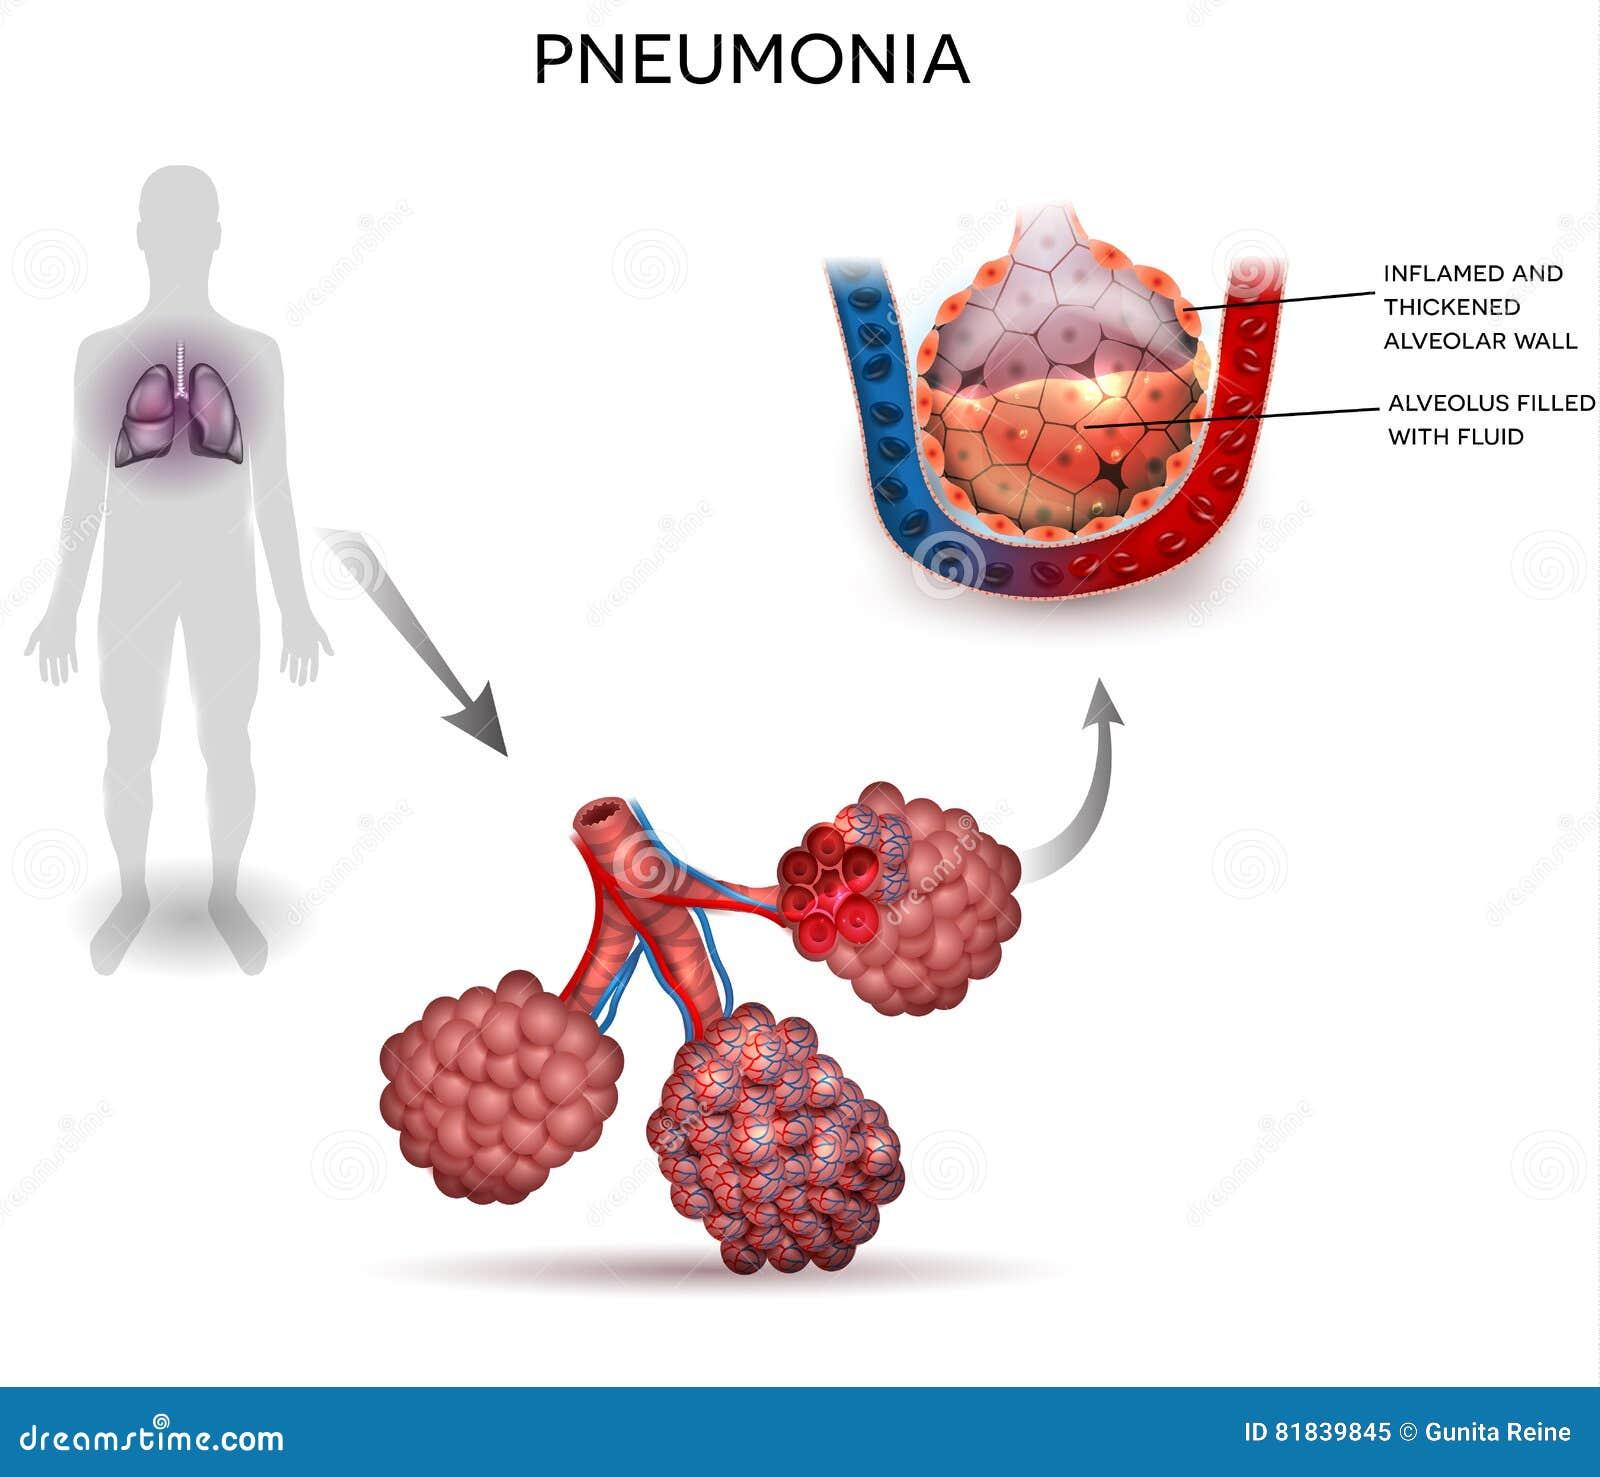 Pneumonia Cartoons  Illustrations   Vector Stock Images